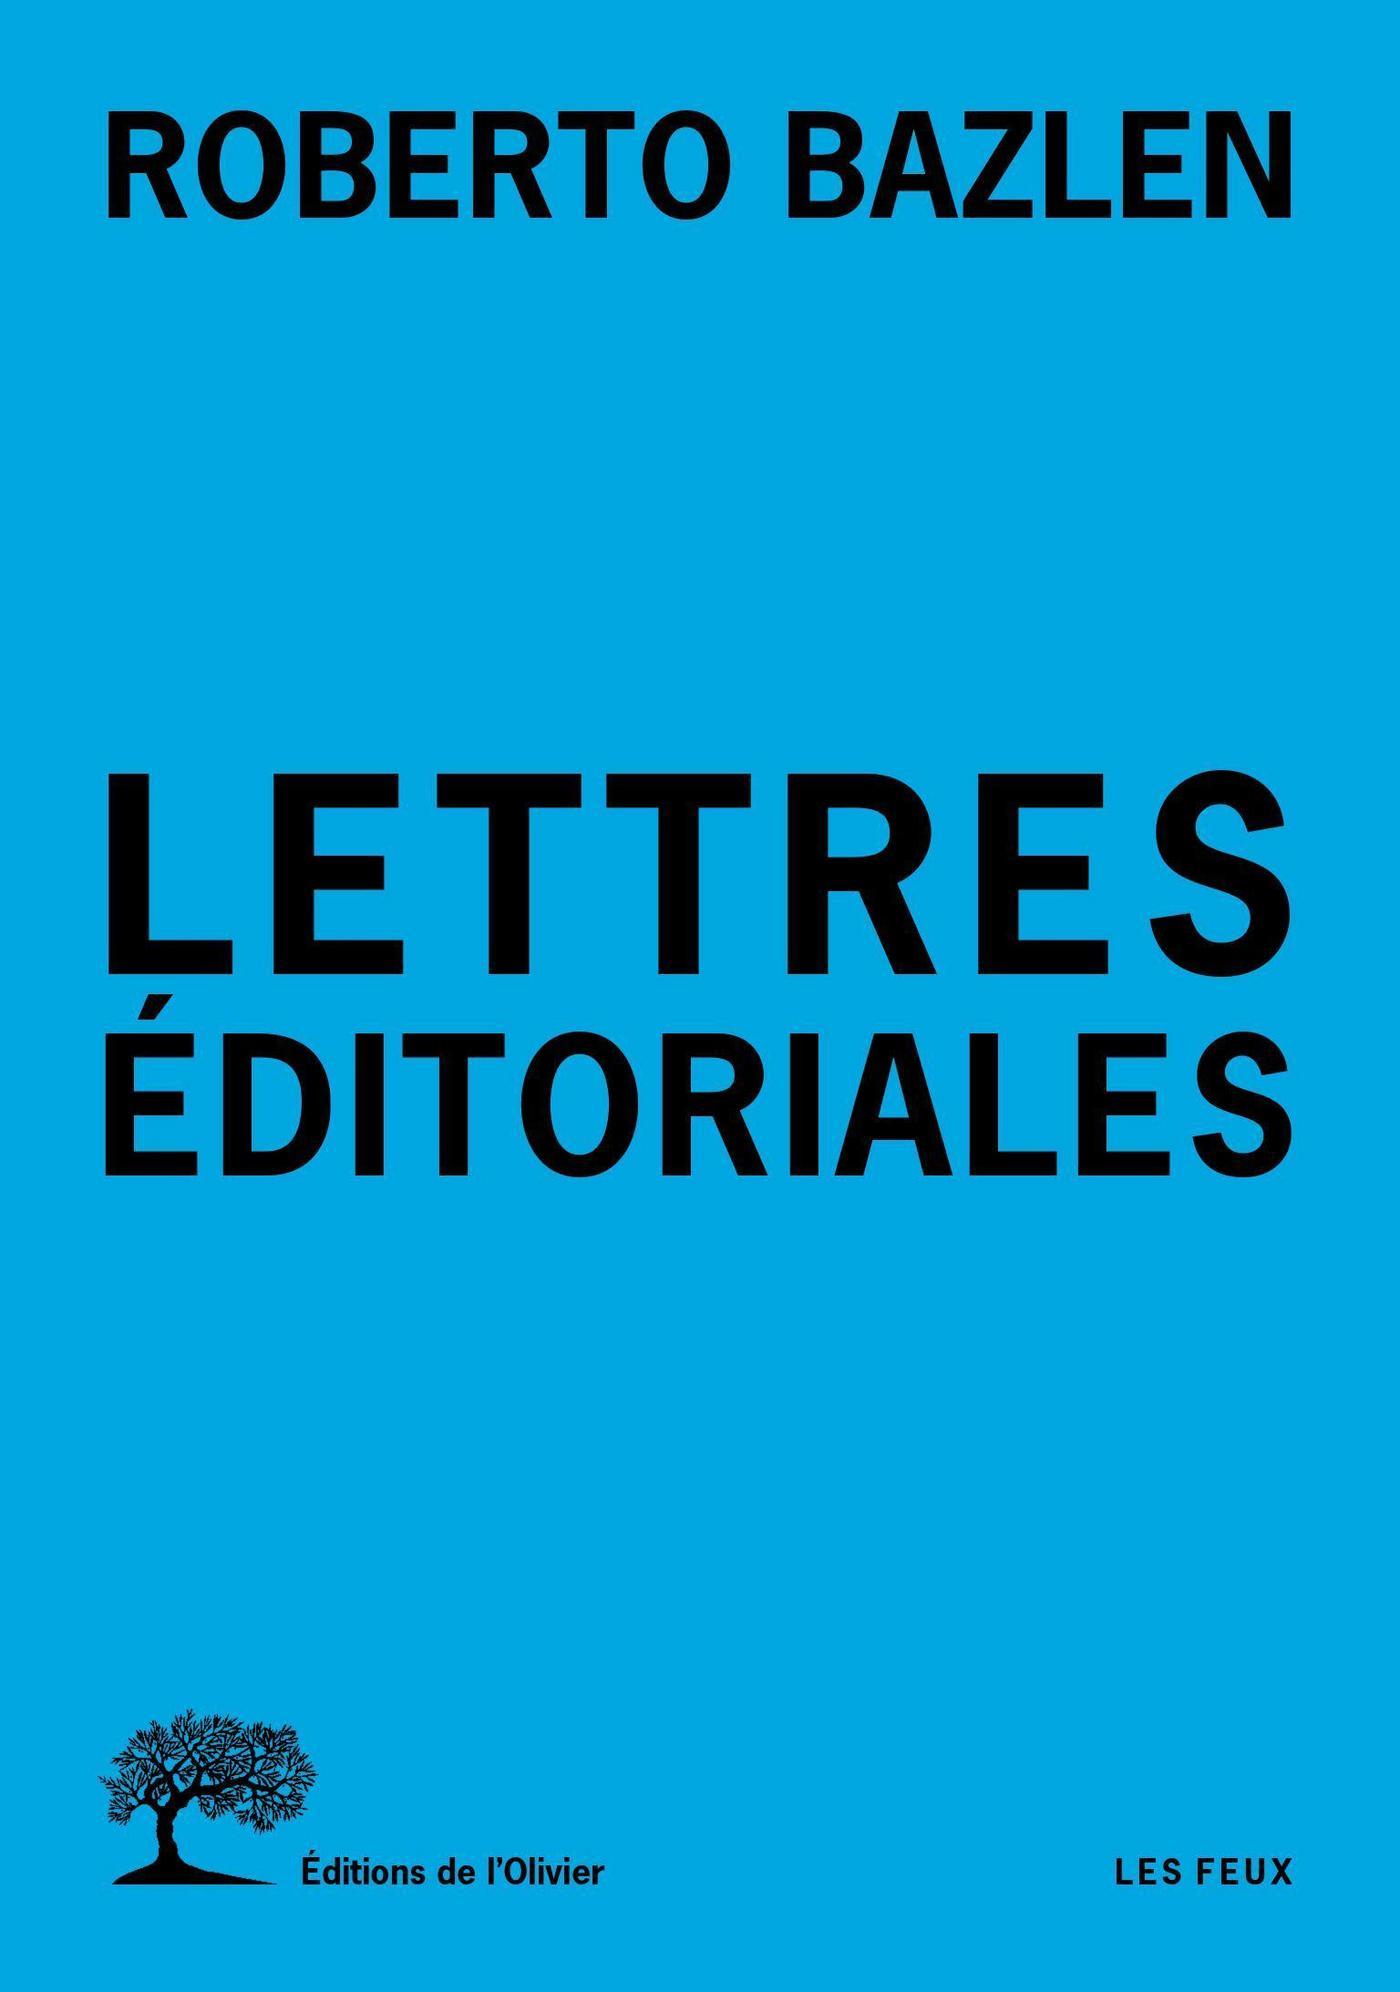 Lettres éditoriales